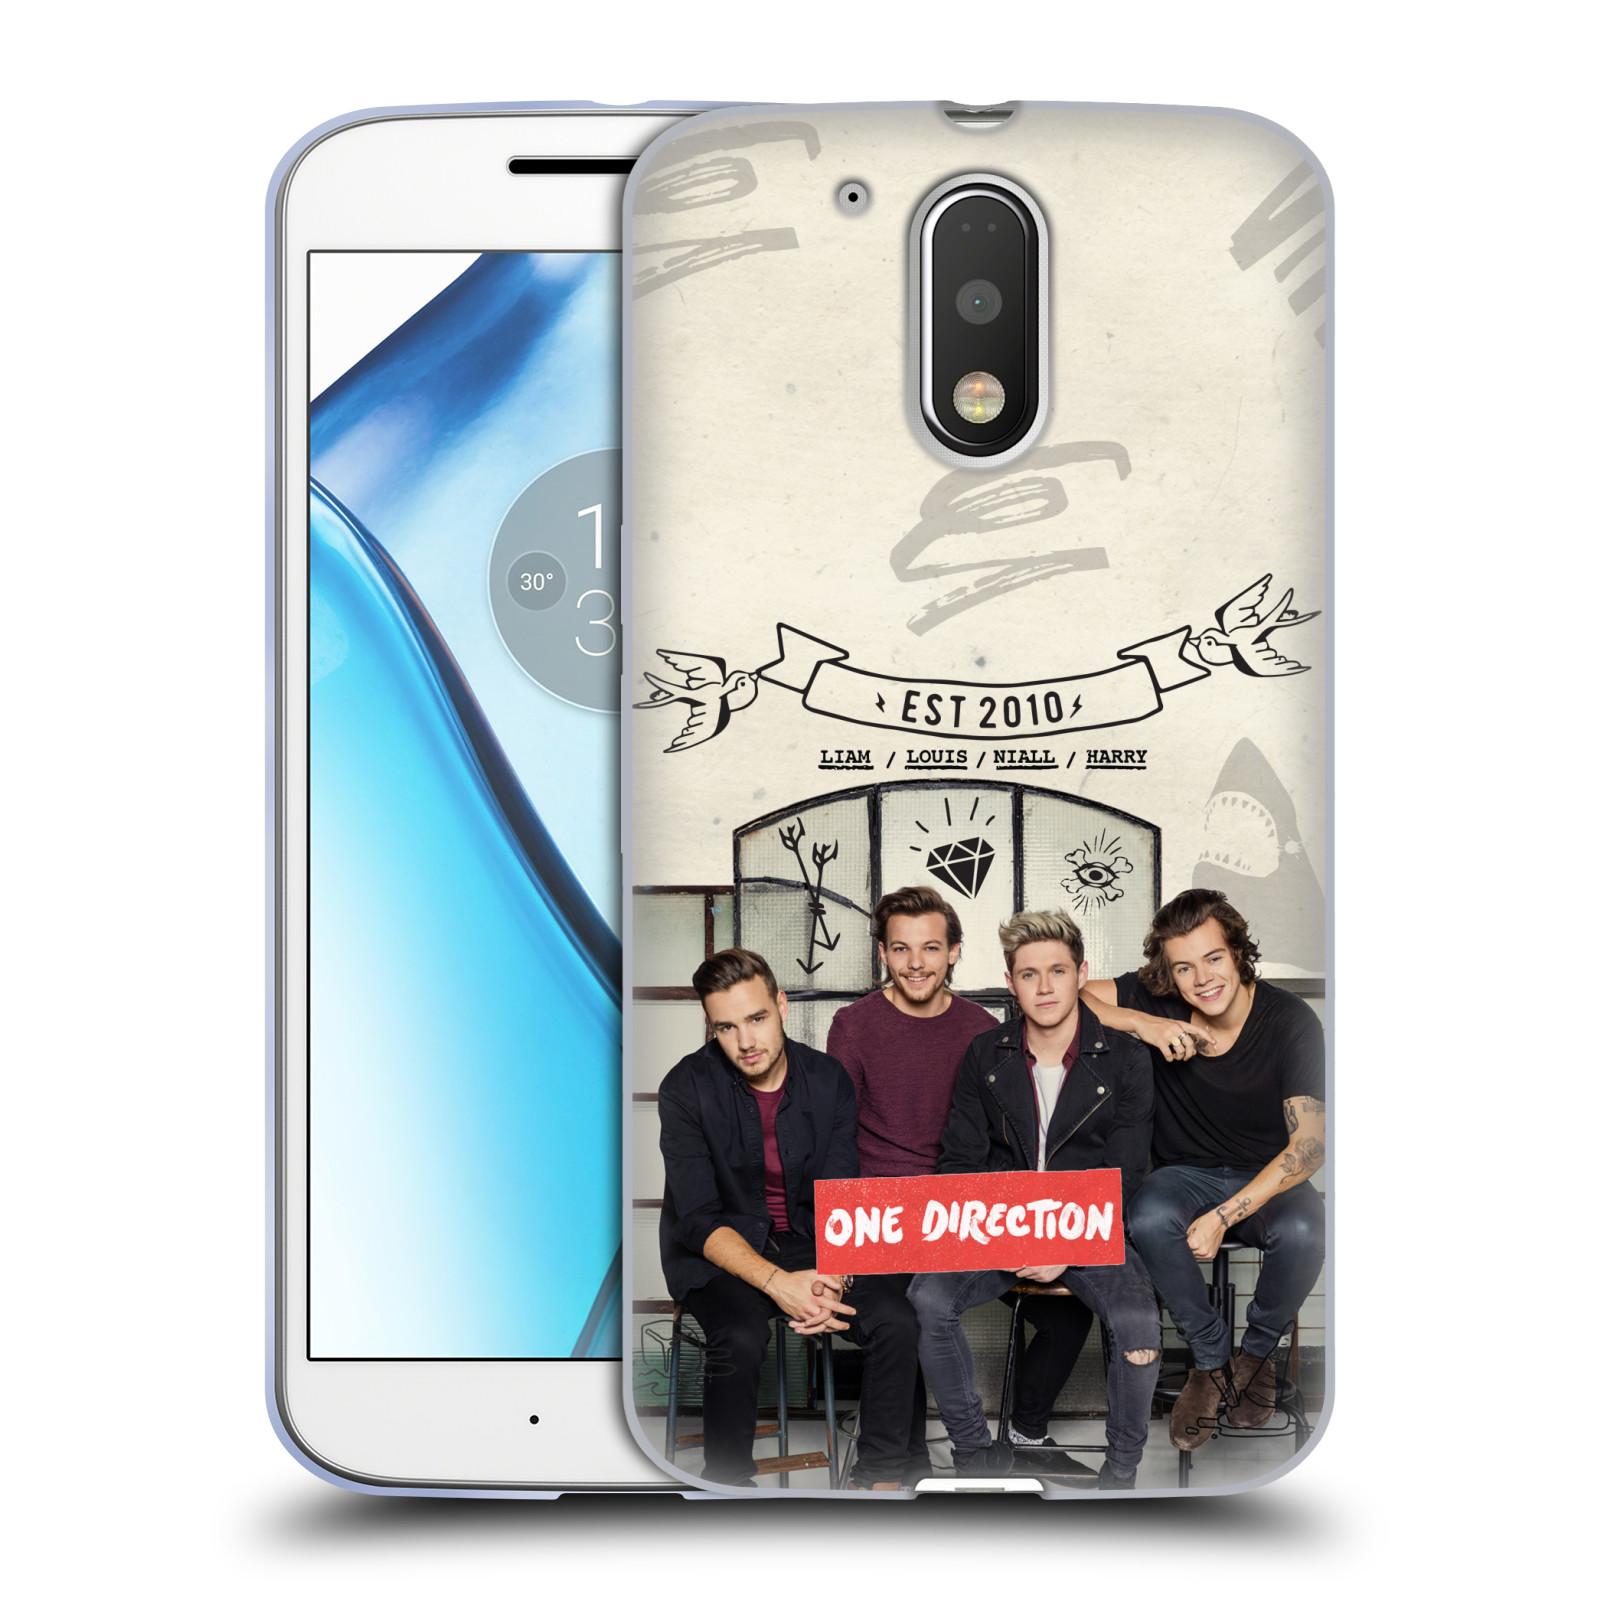 Silikonové pouzdro na mobil Lenovo Moto G4 HEAD CASE One Direction - EST 2010 (Silikonový kryt či obal One Direction Official na mobilní telefon Lenovo Moto G4 (Single a Dual SIM))